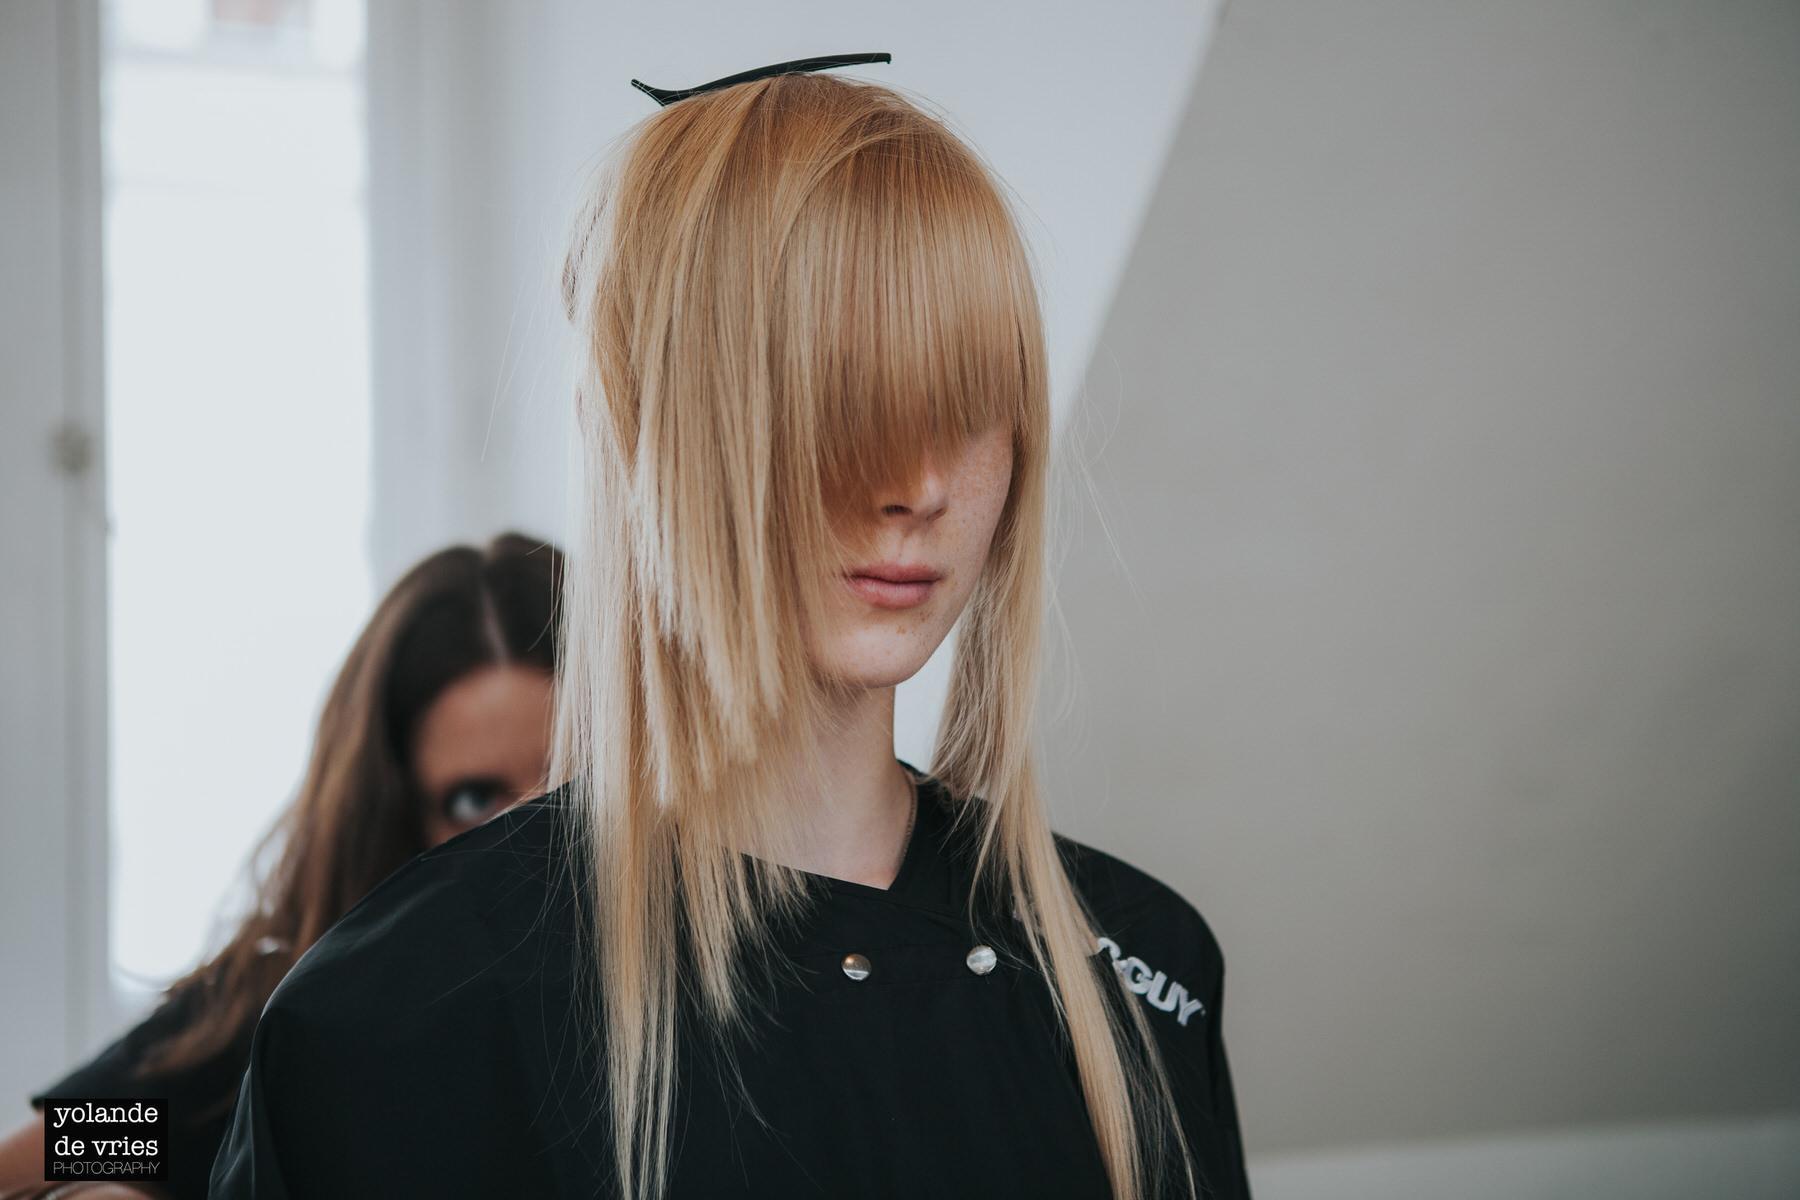 Elite-Model-Look-2011-Toni-Guy-Makeovers-4588.jpg